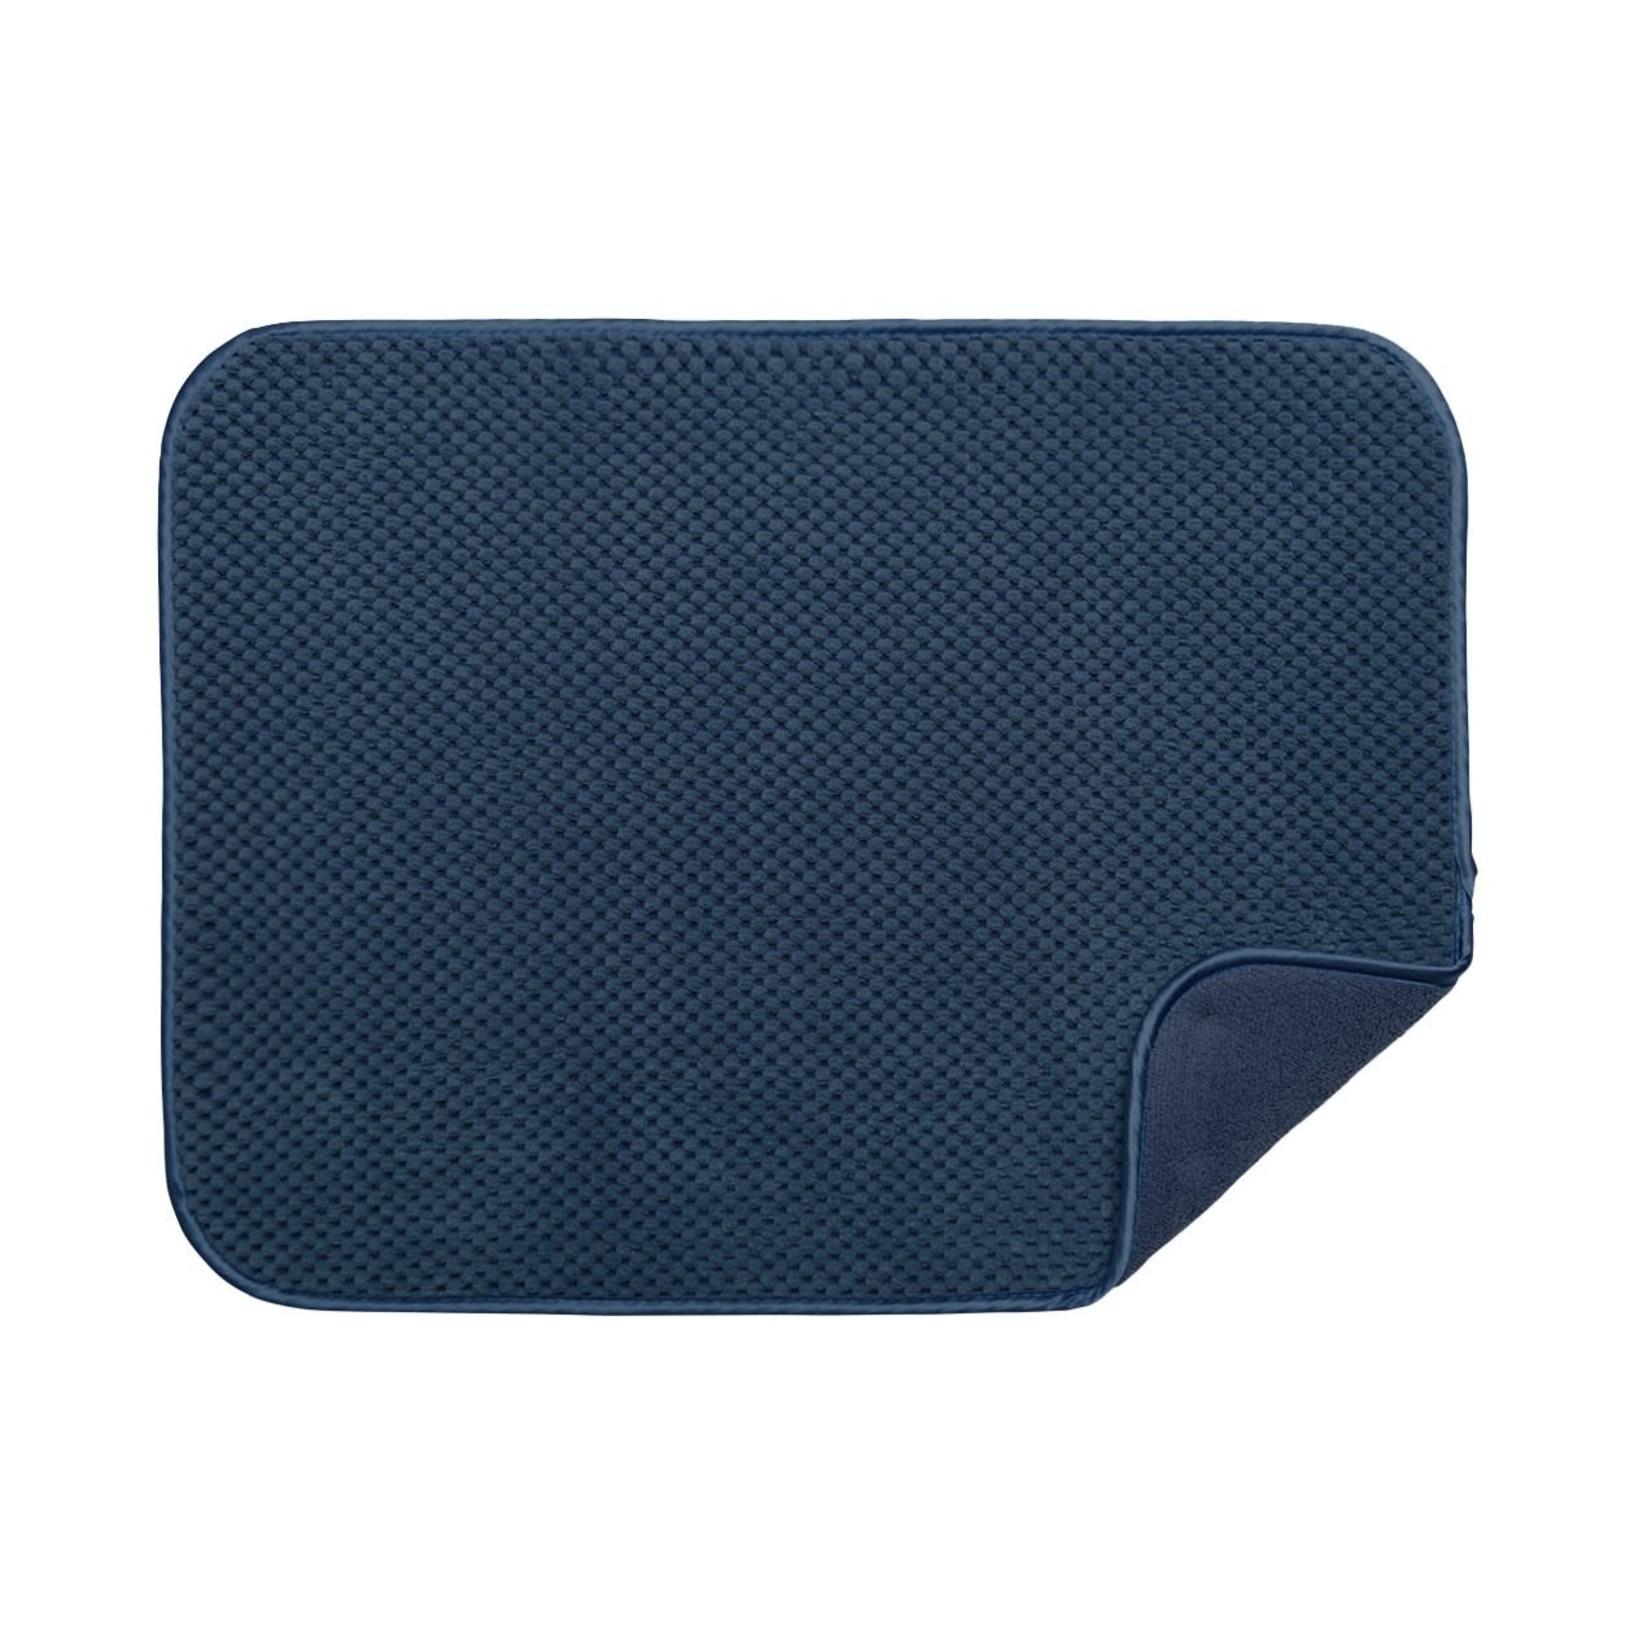 Luxe Plush Oversized Drying Mat Indigo